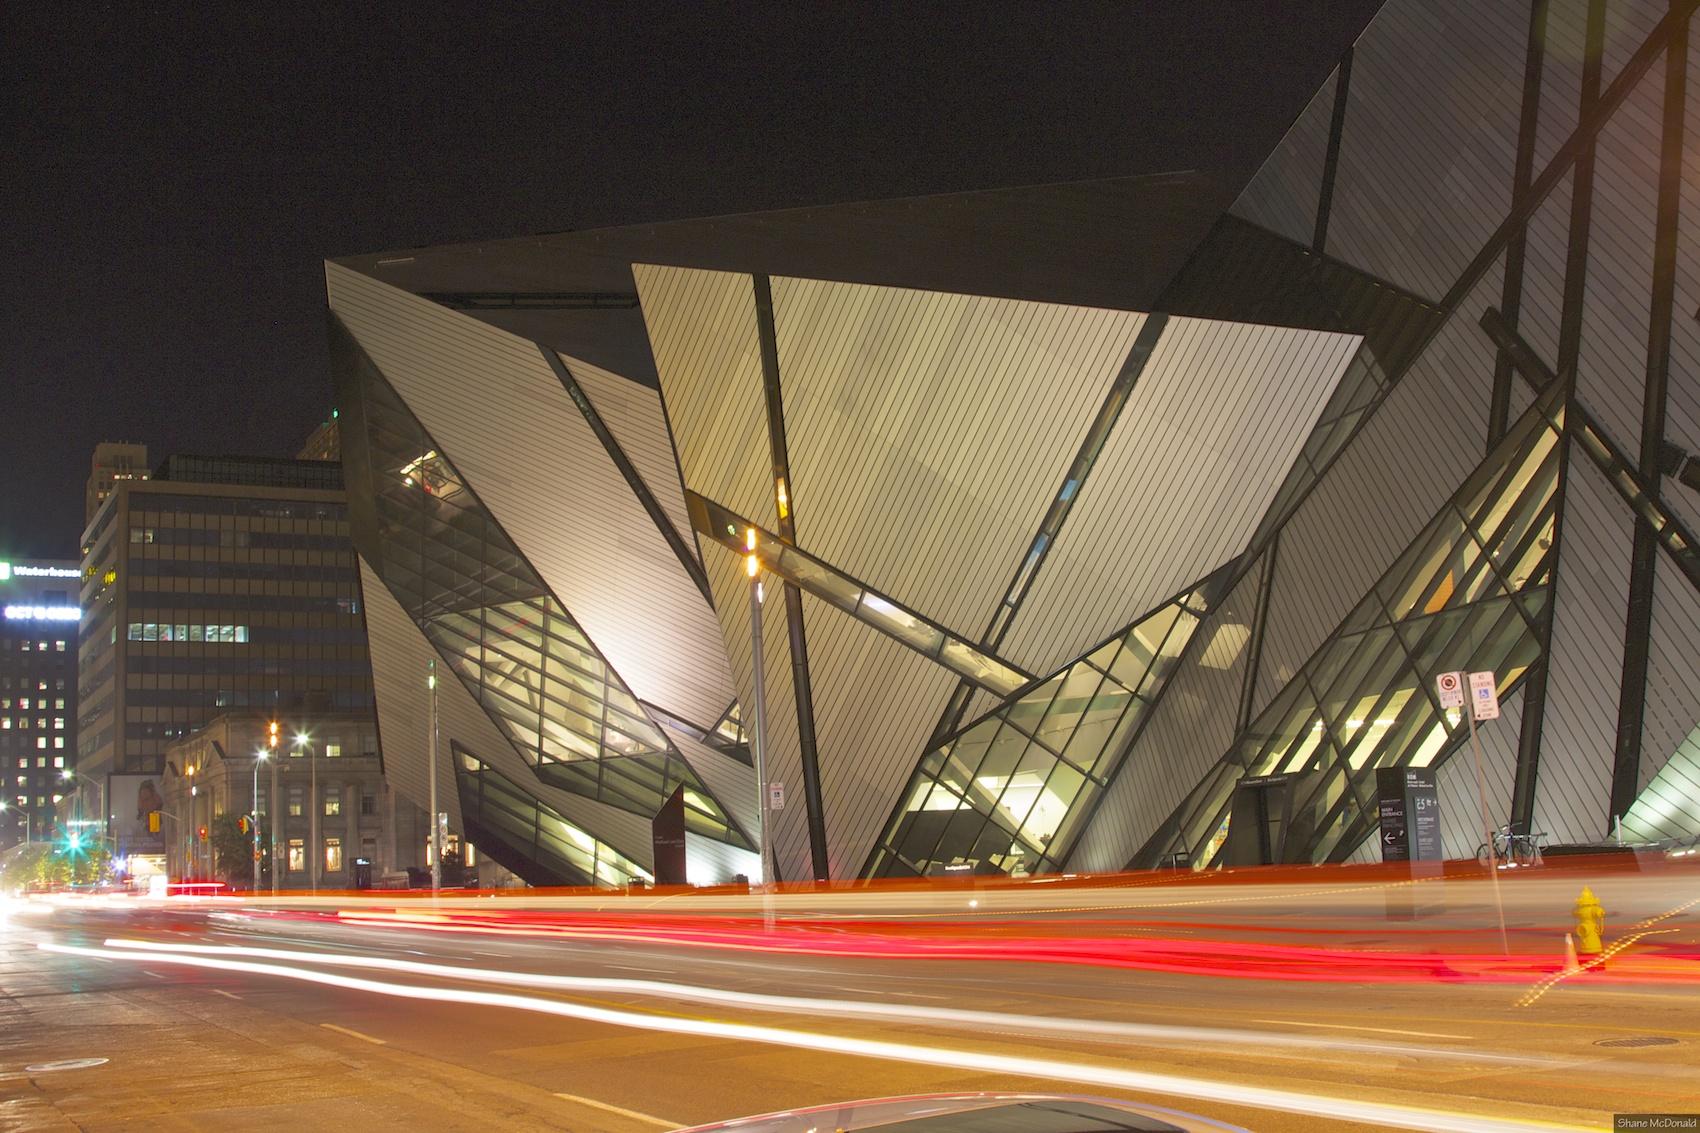 Royal Ontario Museum, Toronto, Canada – 28/Project 52